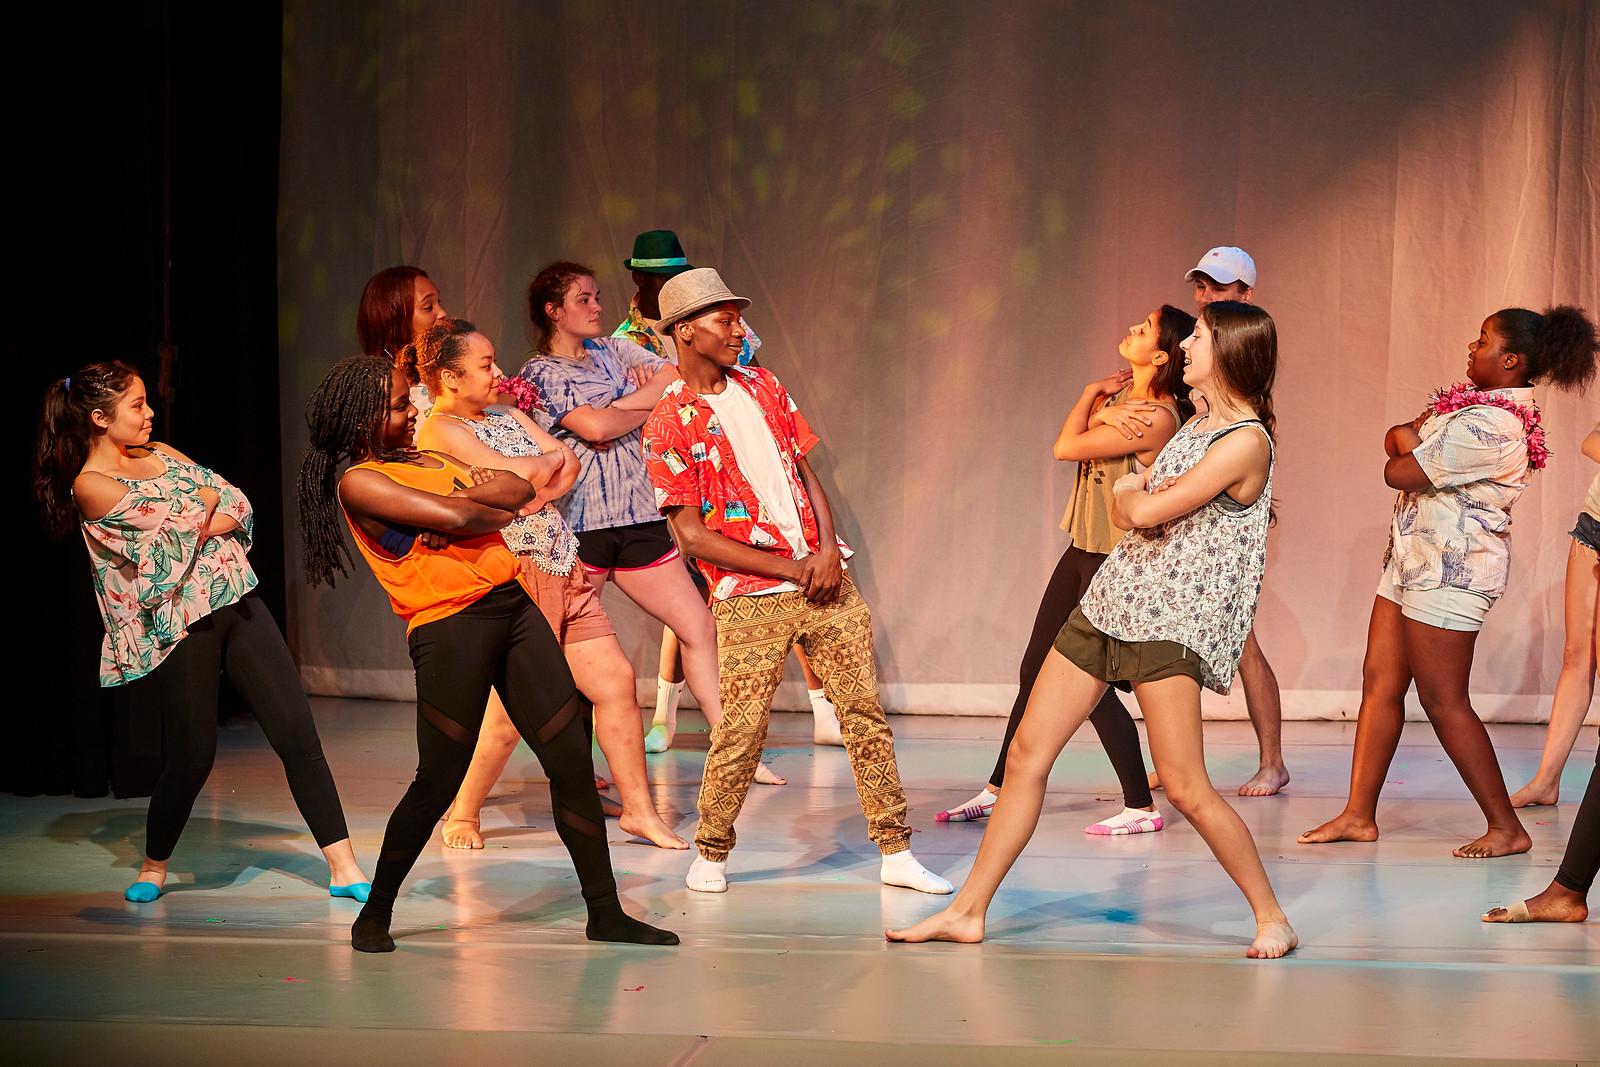 Mayfair dance - May 17, 2017- 44337-X3.jpg